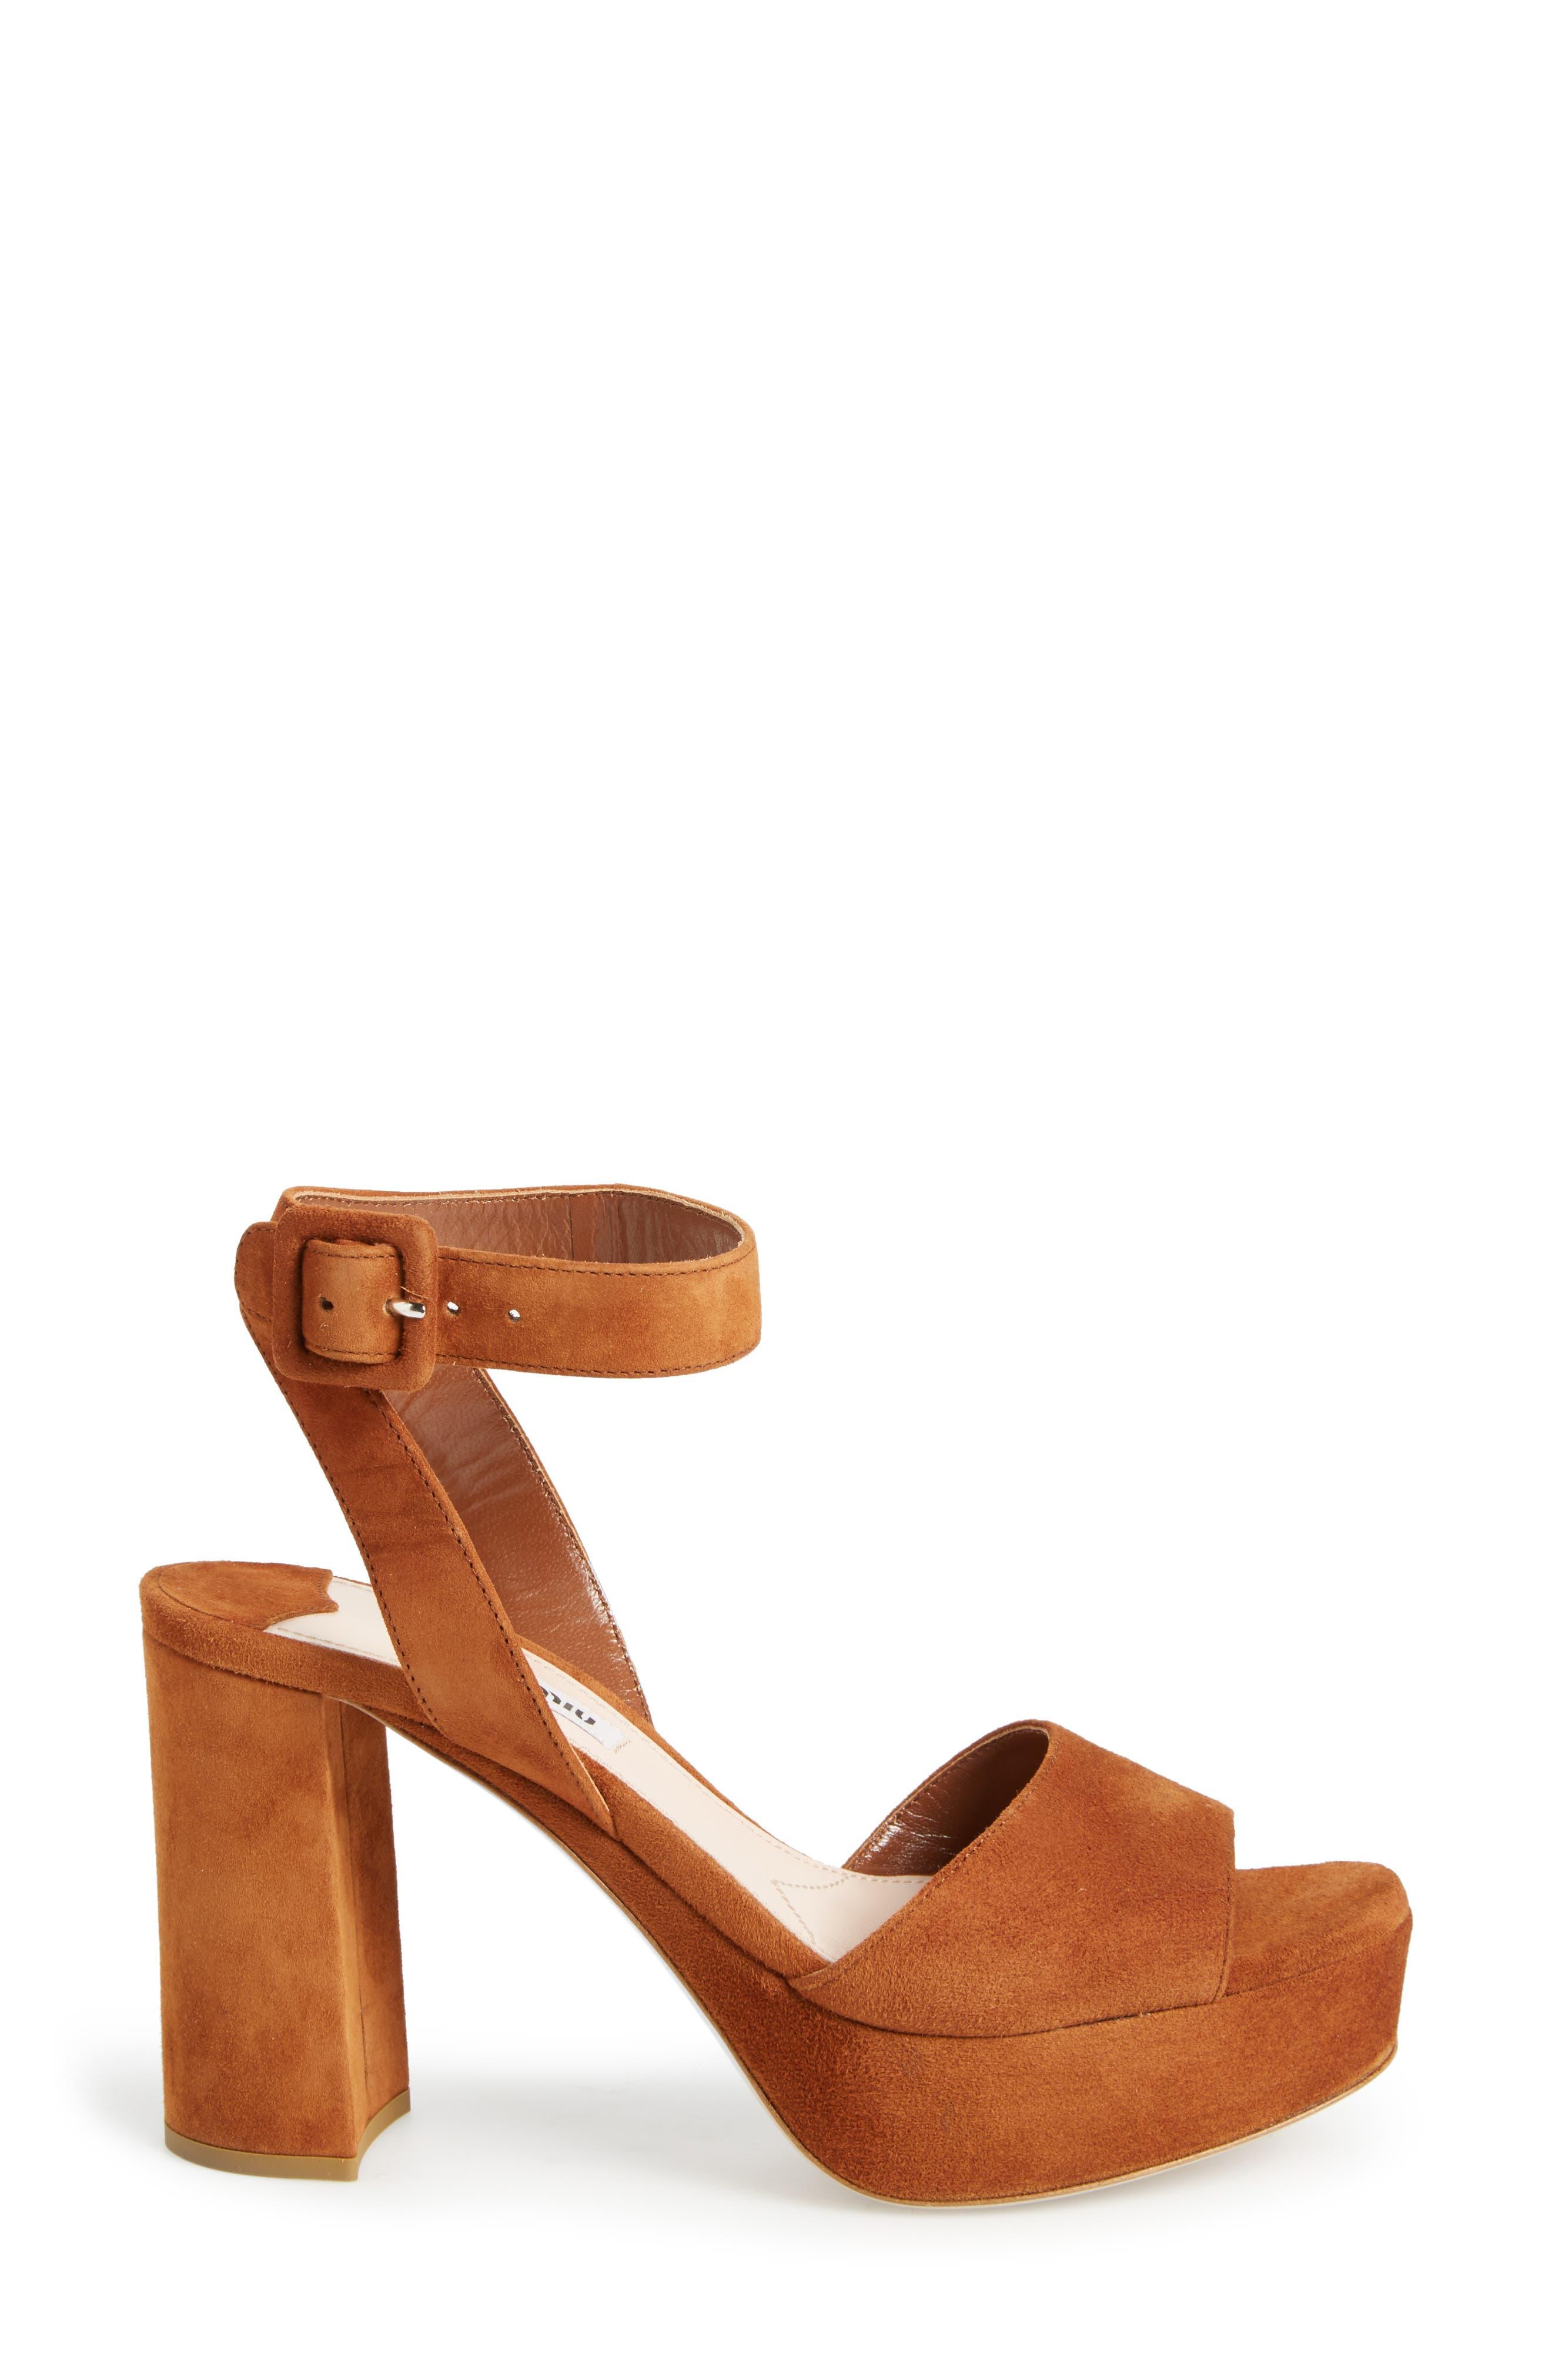 'Sandali' Ankle Strap Sandal,                             Alternate thumbnail 21, color,